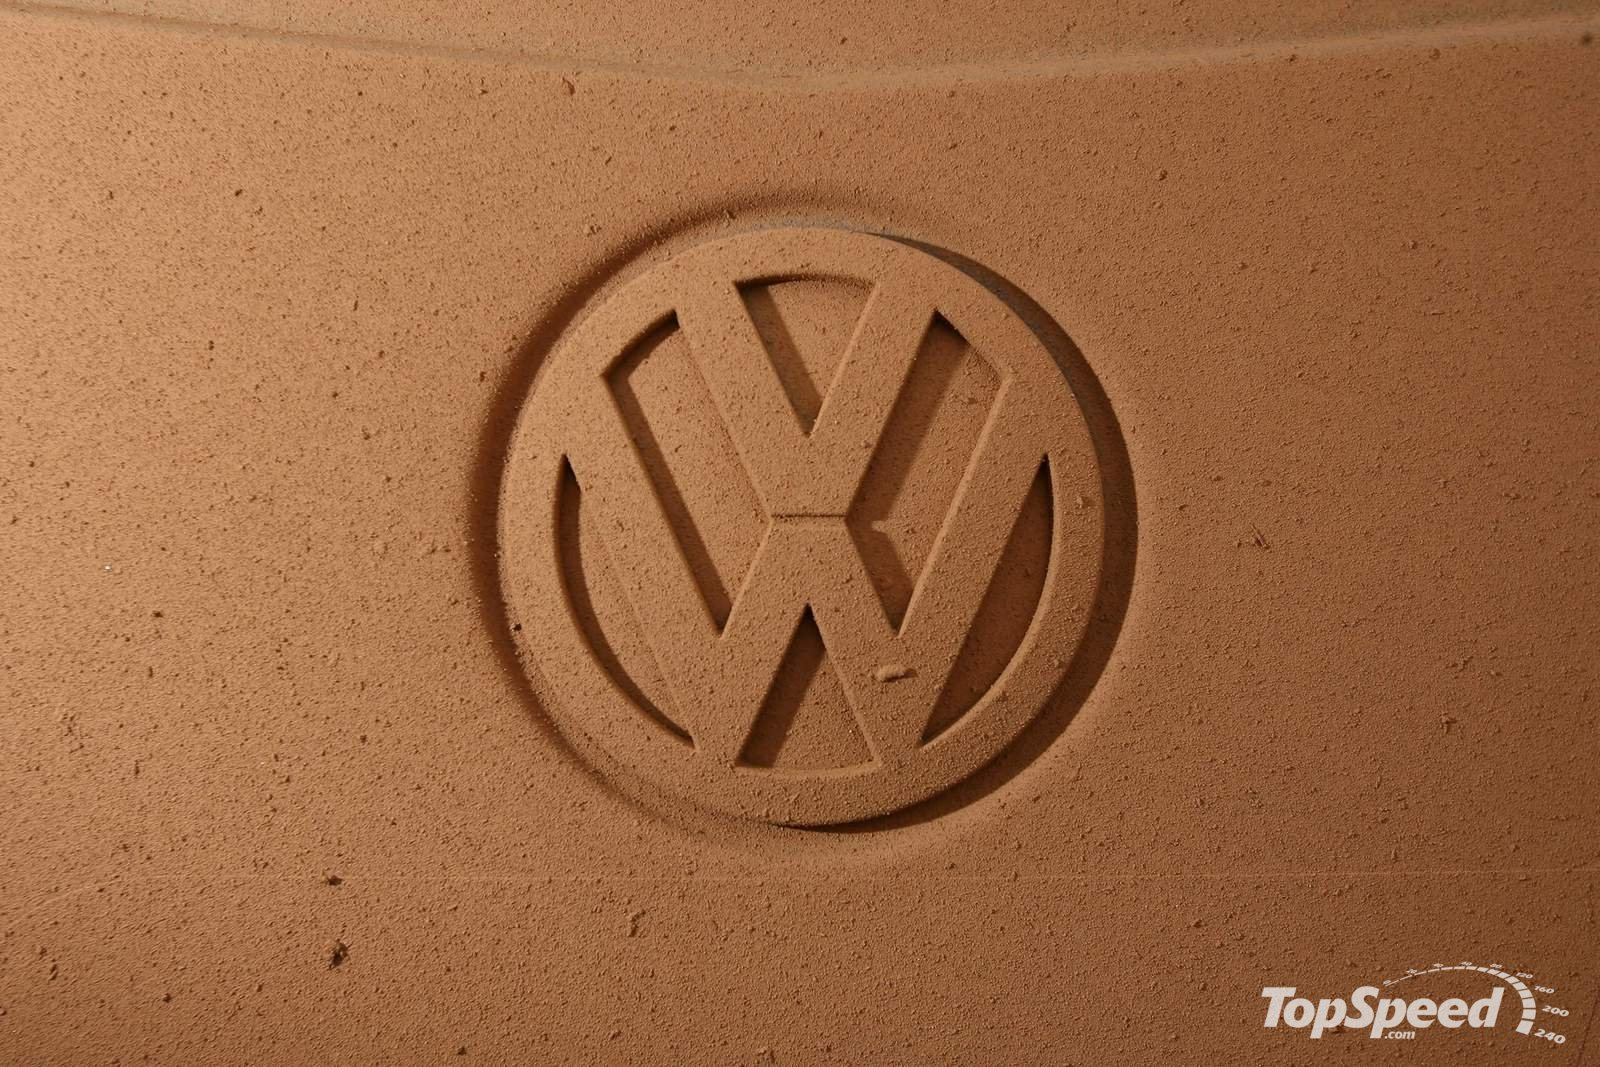 Дакар, Значок Wolksvagen Dakar rally car, авто, обои для рабочего стола, Логотип, лого